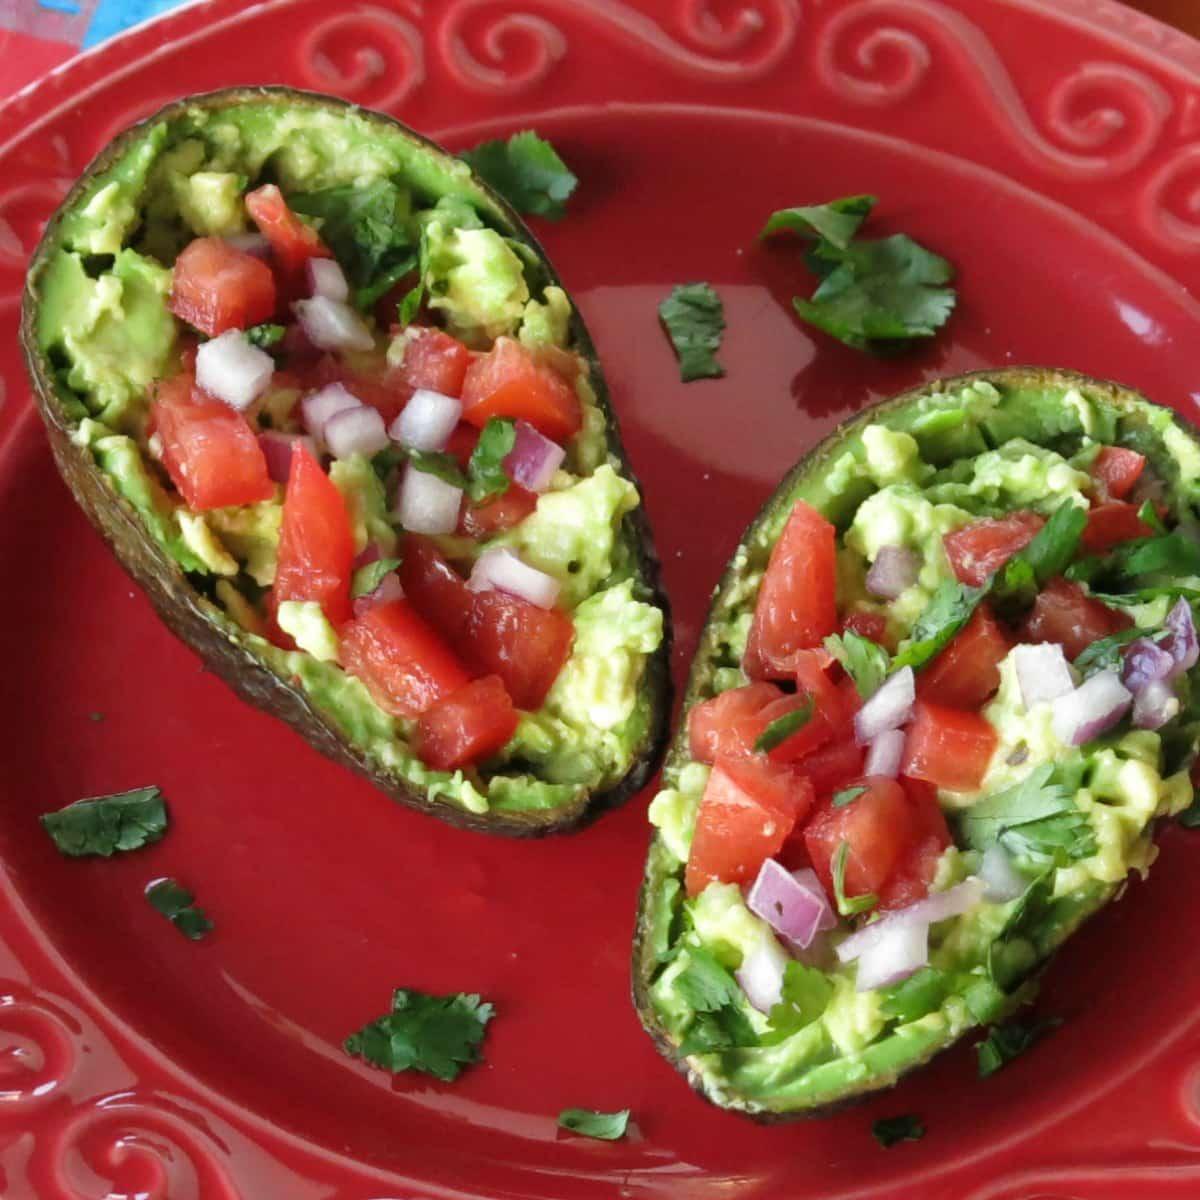 An avocado cut in half with guacamole inside each half